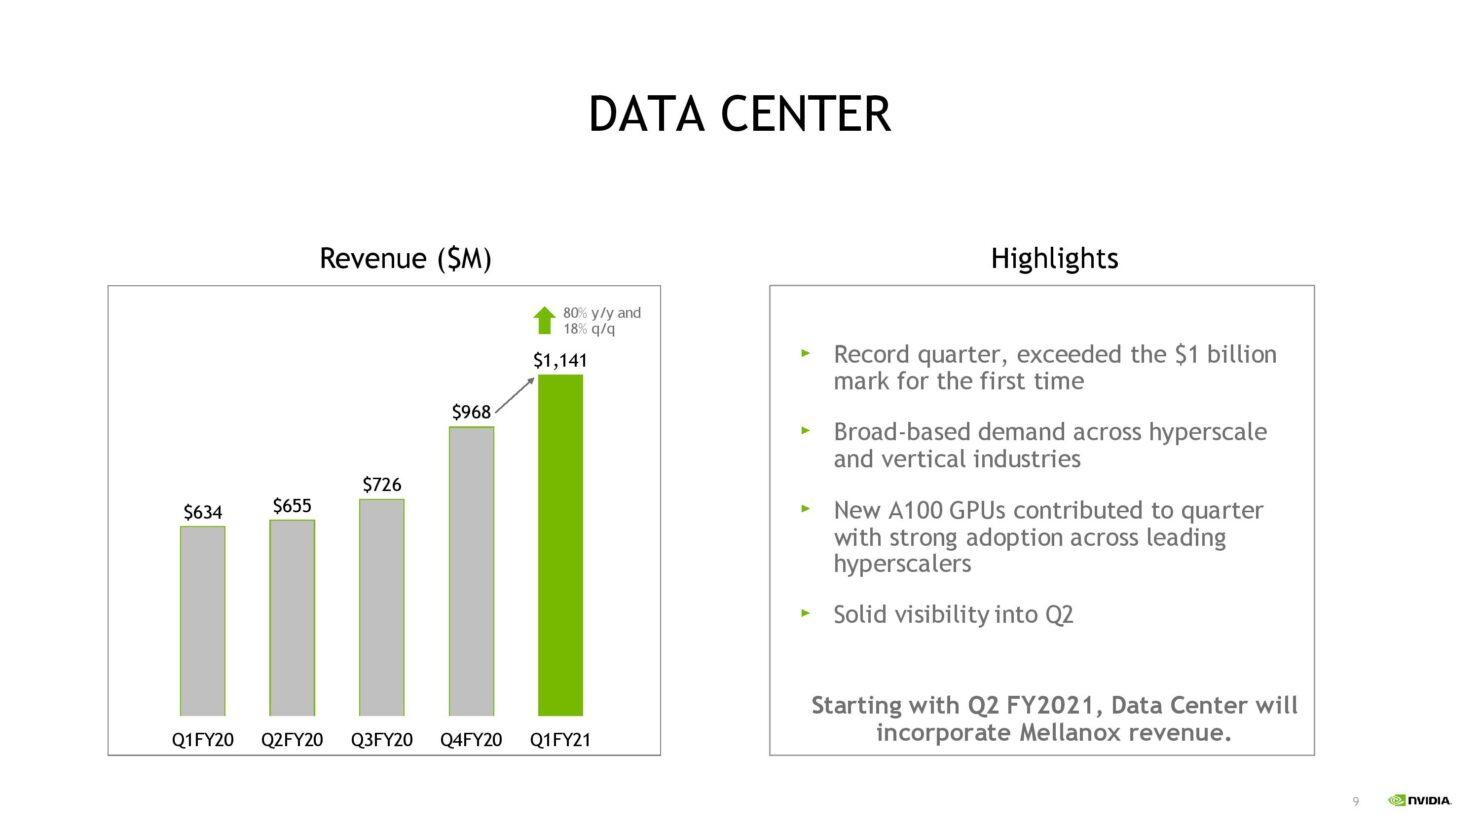 nvda-1qfy21-investor-presentation-5-21-20-final-page-009